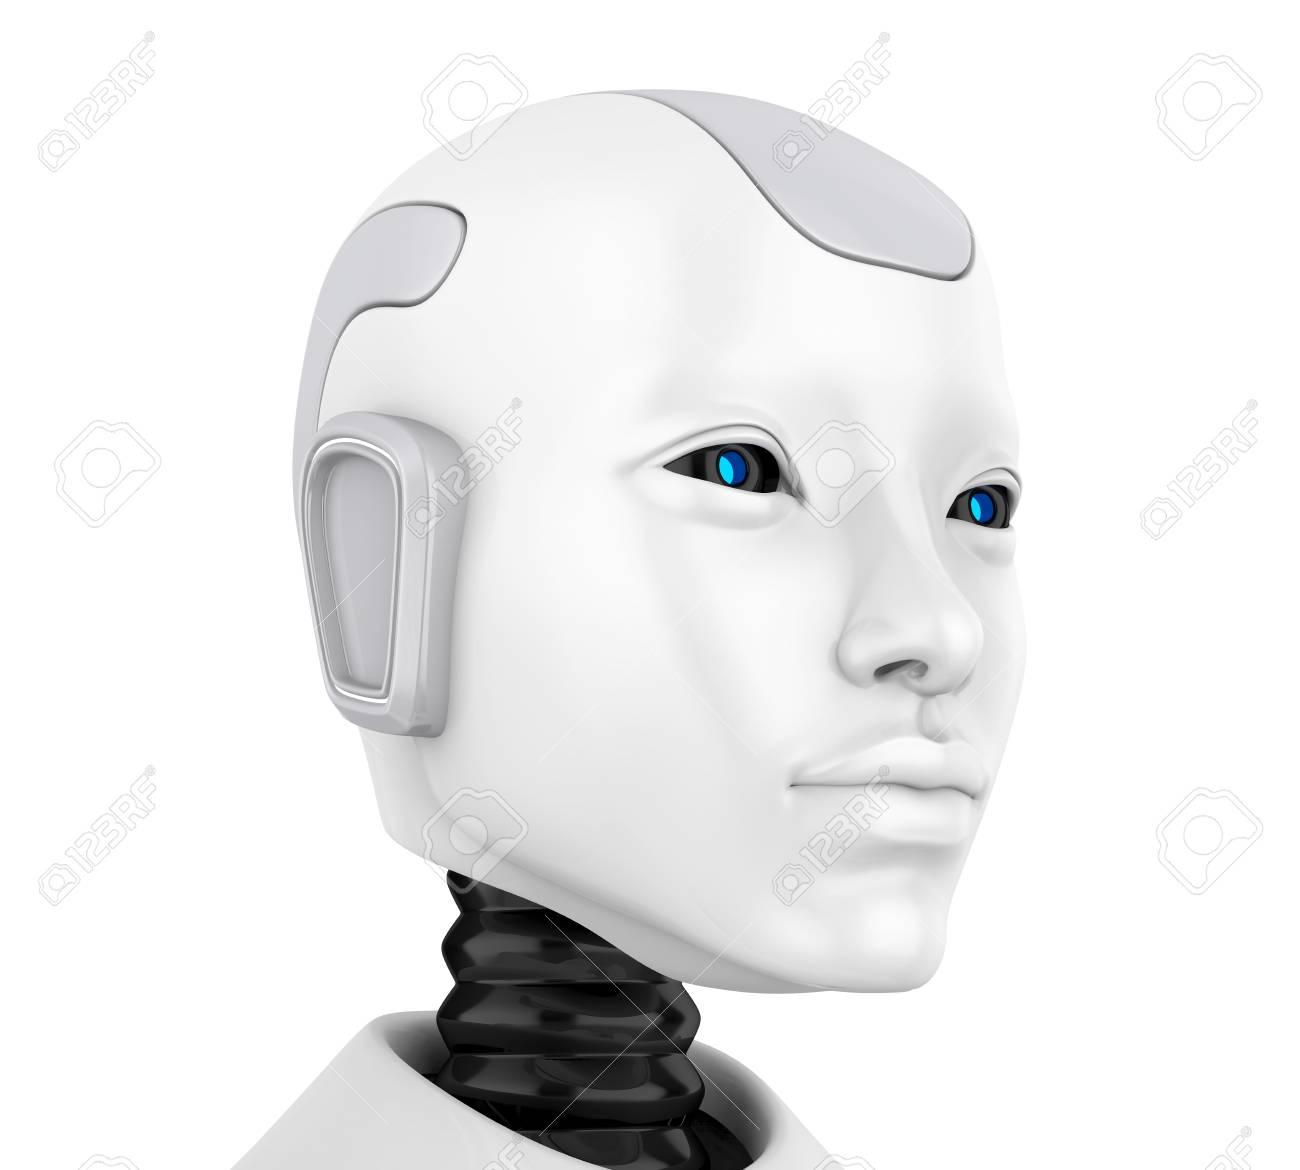 Robot Head Face Illustration - 120082446